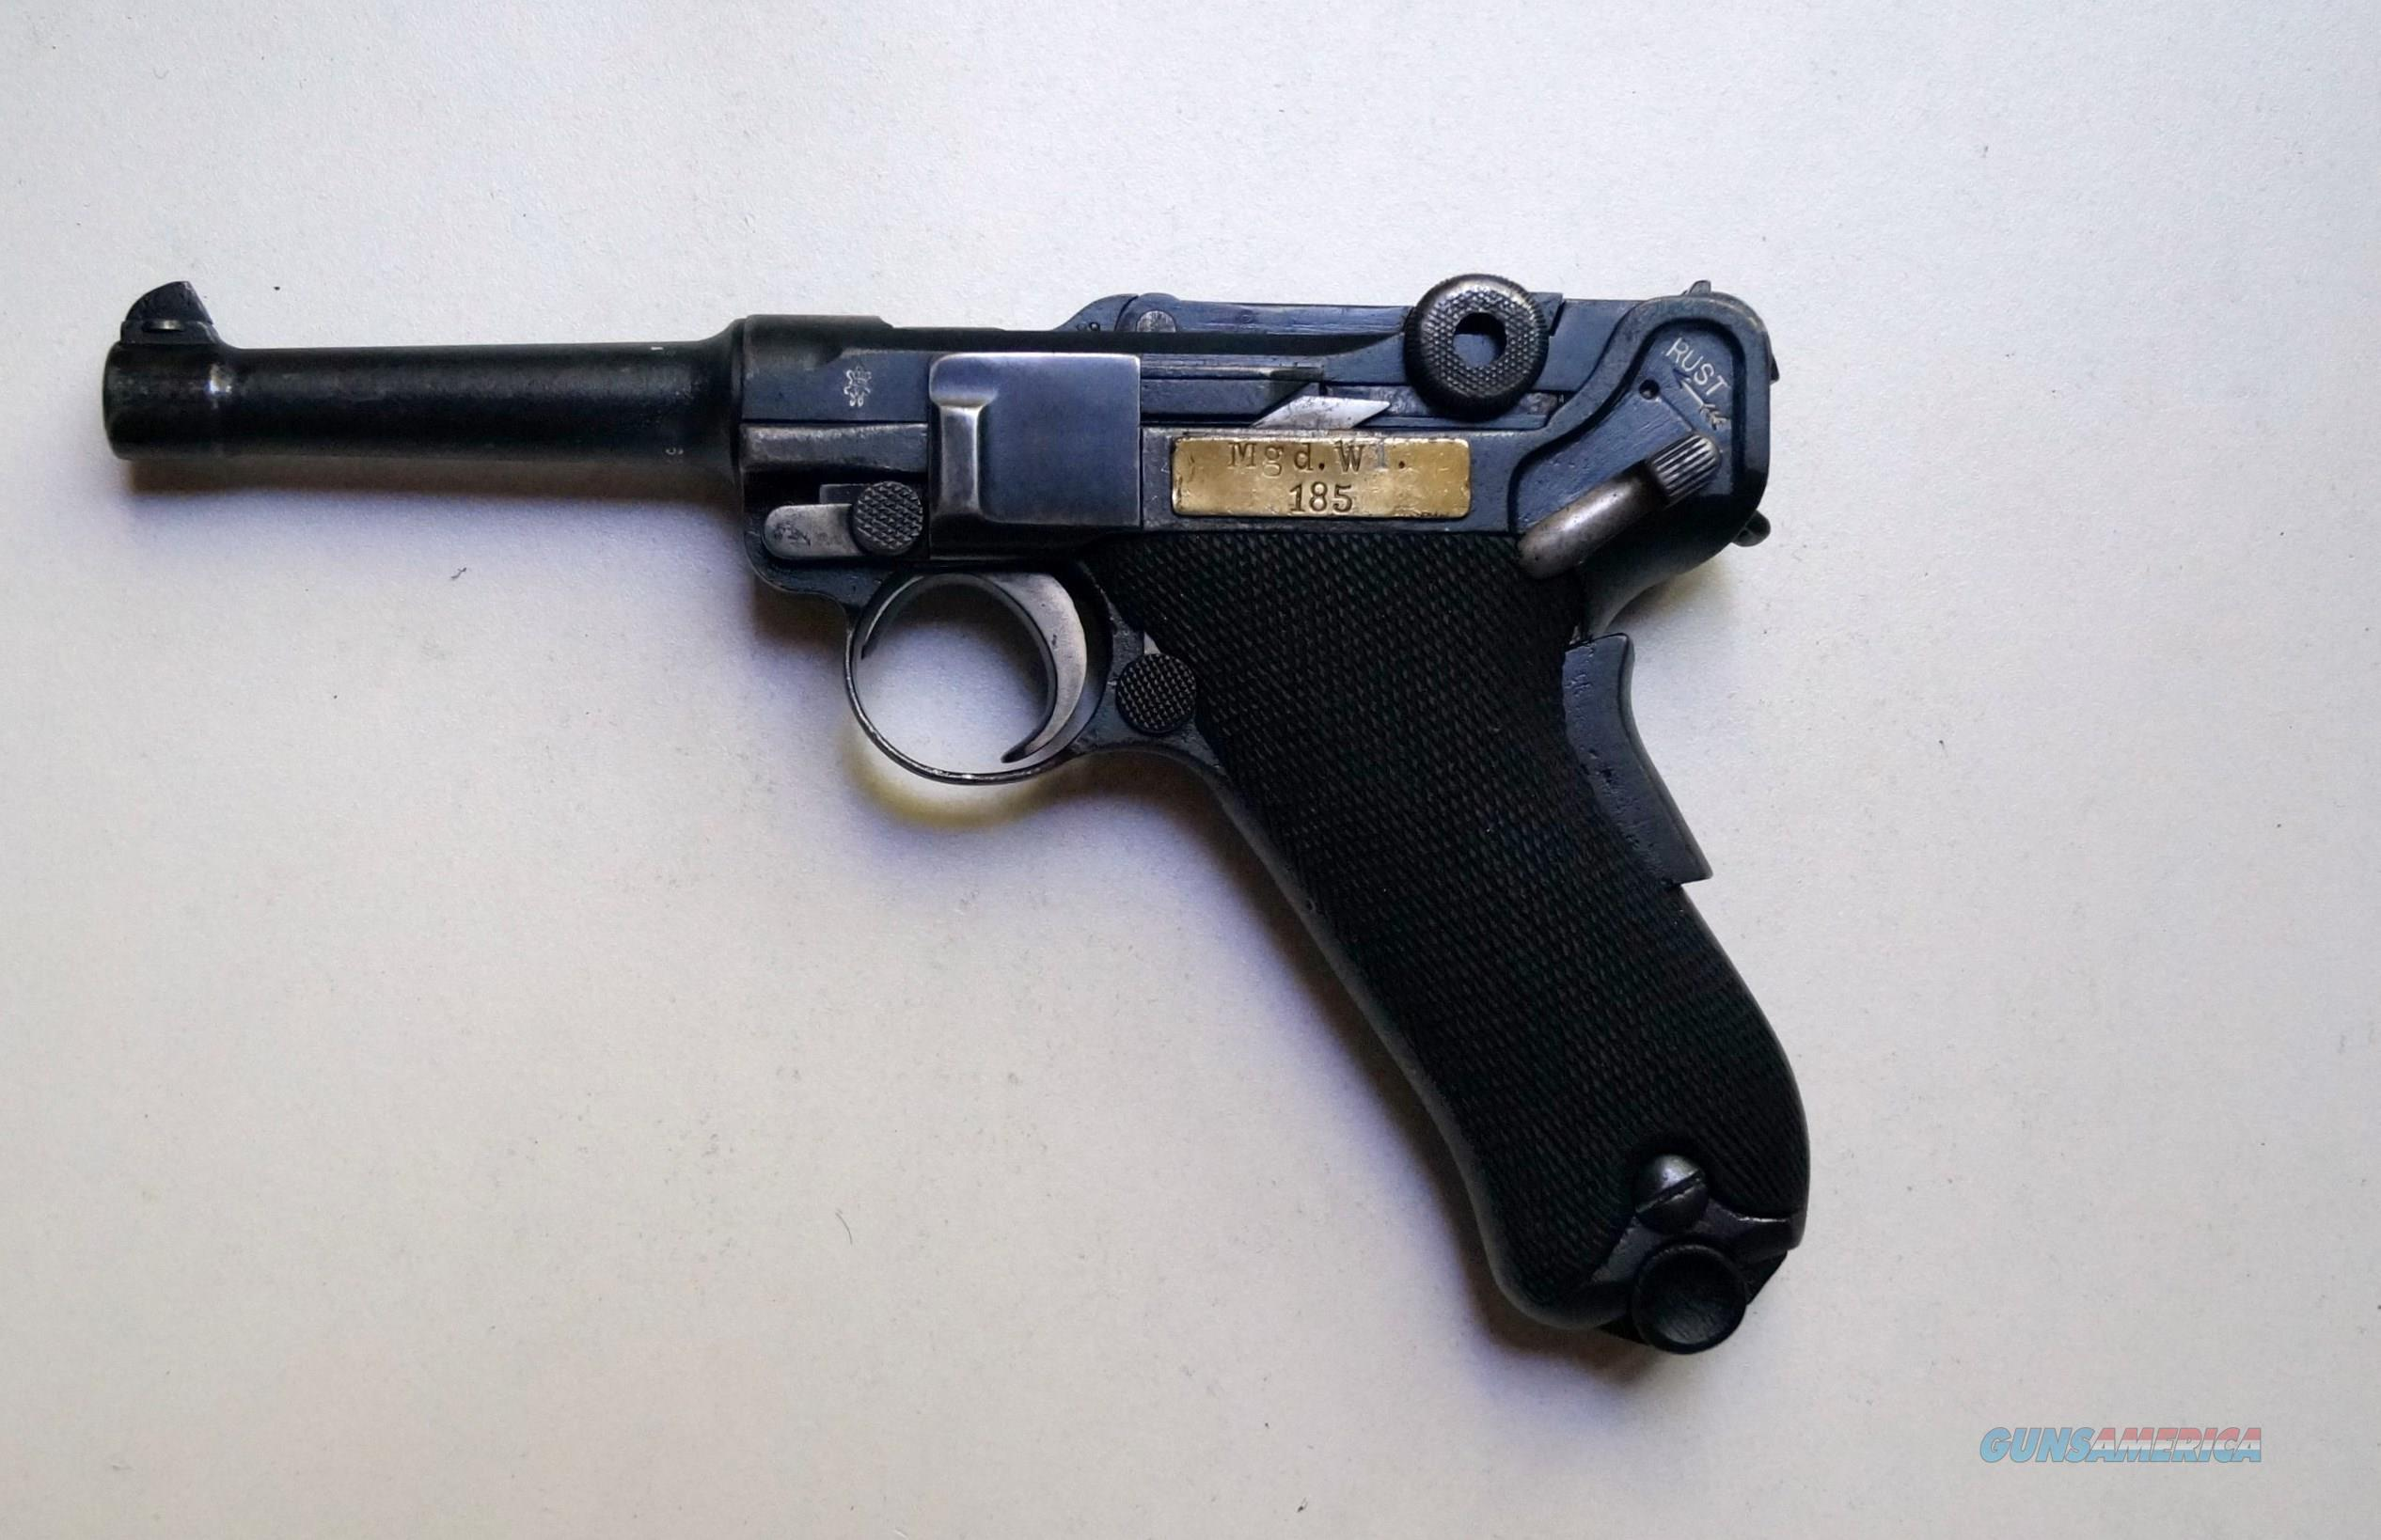 VICKERS LTD (DUTCH CONTRACT) BRITISH MADE LUGER  Guns > Pistols > Luger Pistols